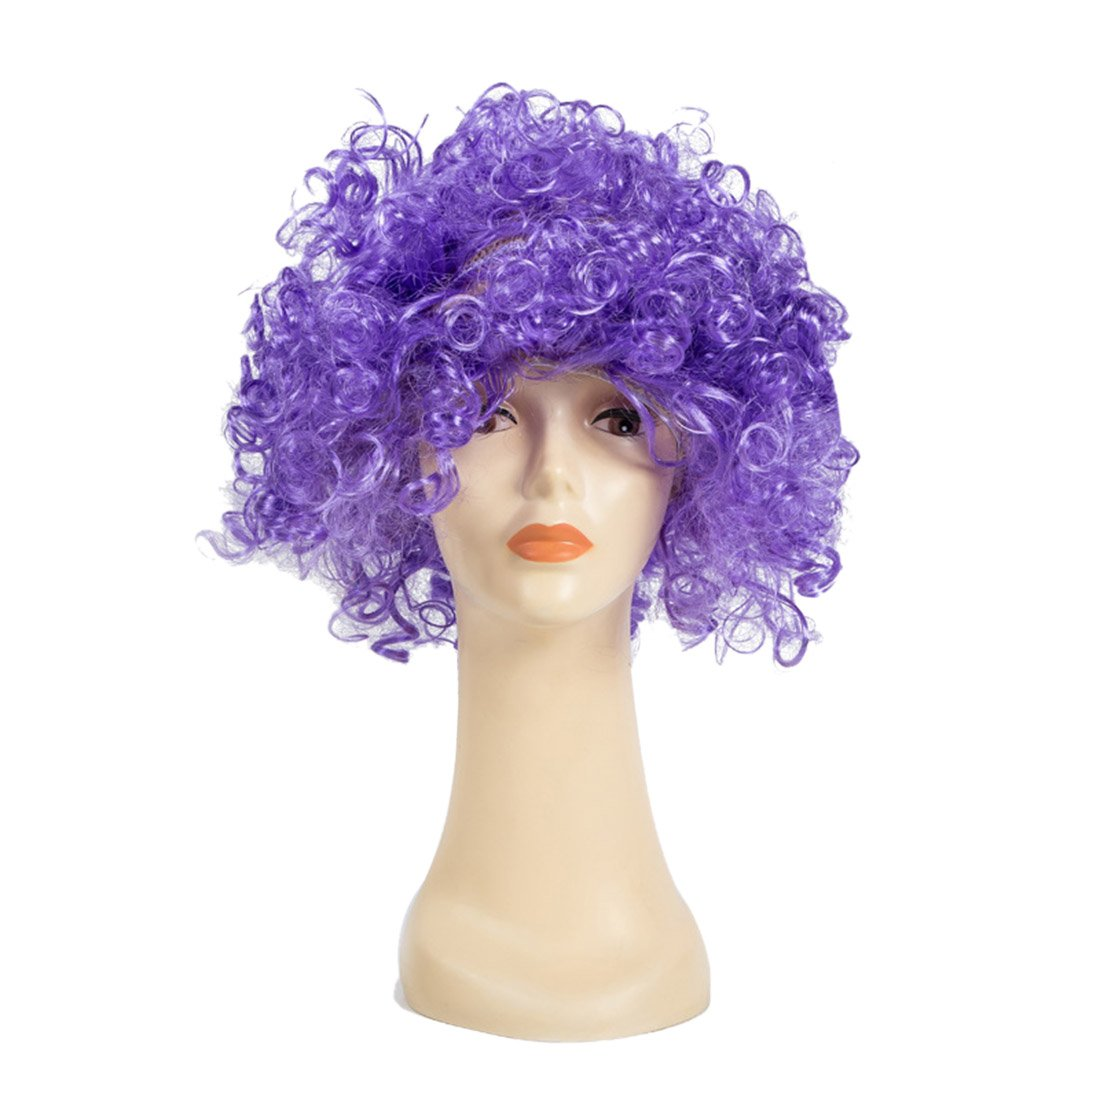 Jiyaru Halloween Afro Wig Curly Clown Costume Unisex Adults Kids Party Fun Hair Purple